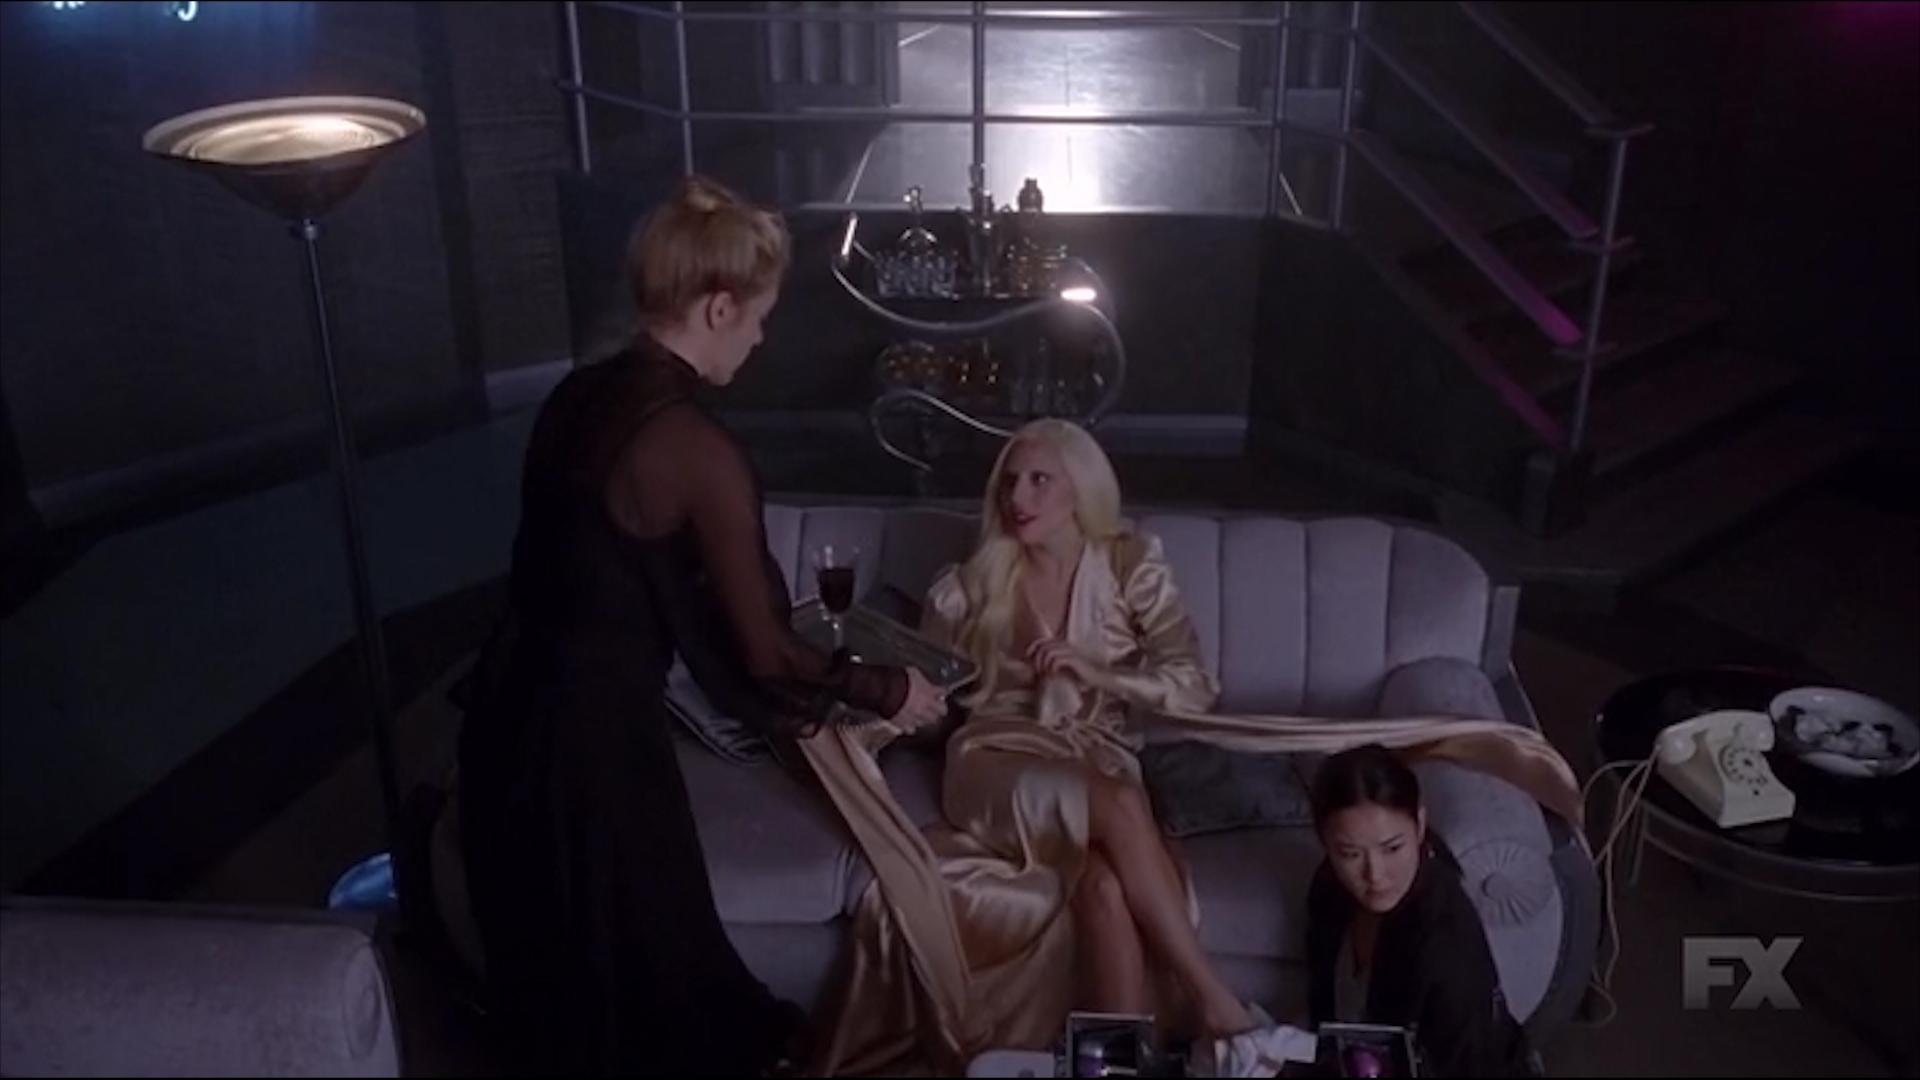 Chloë Sevigny, Lady Gaga, and Grace Su in American Horror Story: Hotel